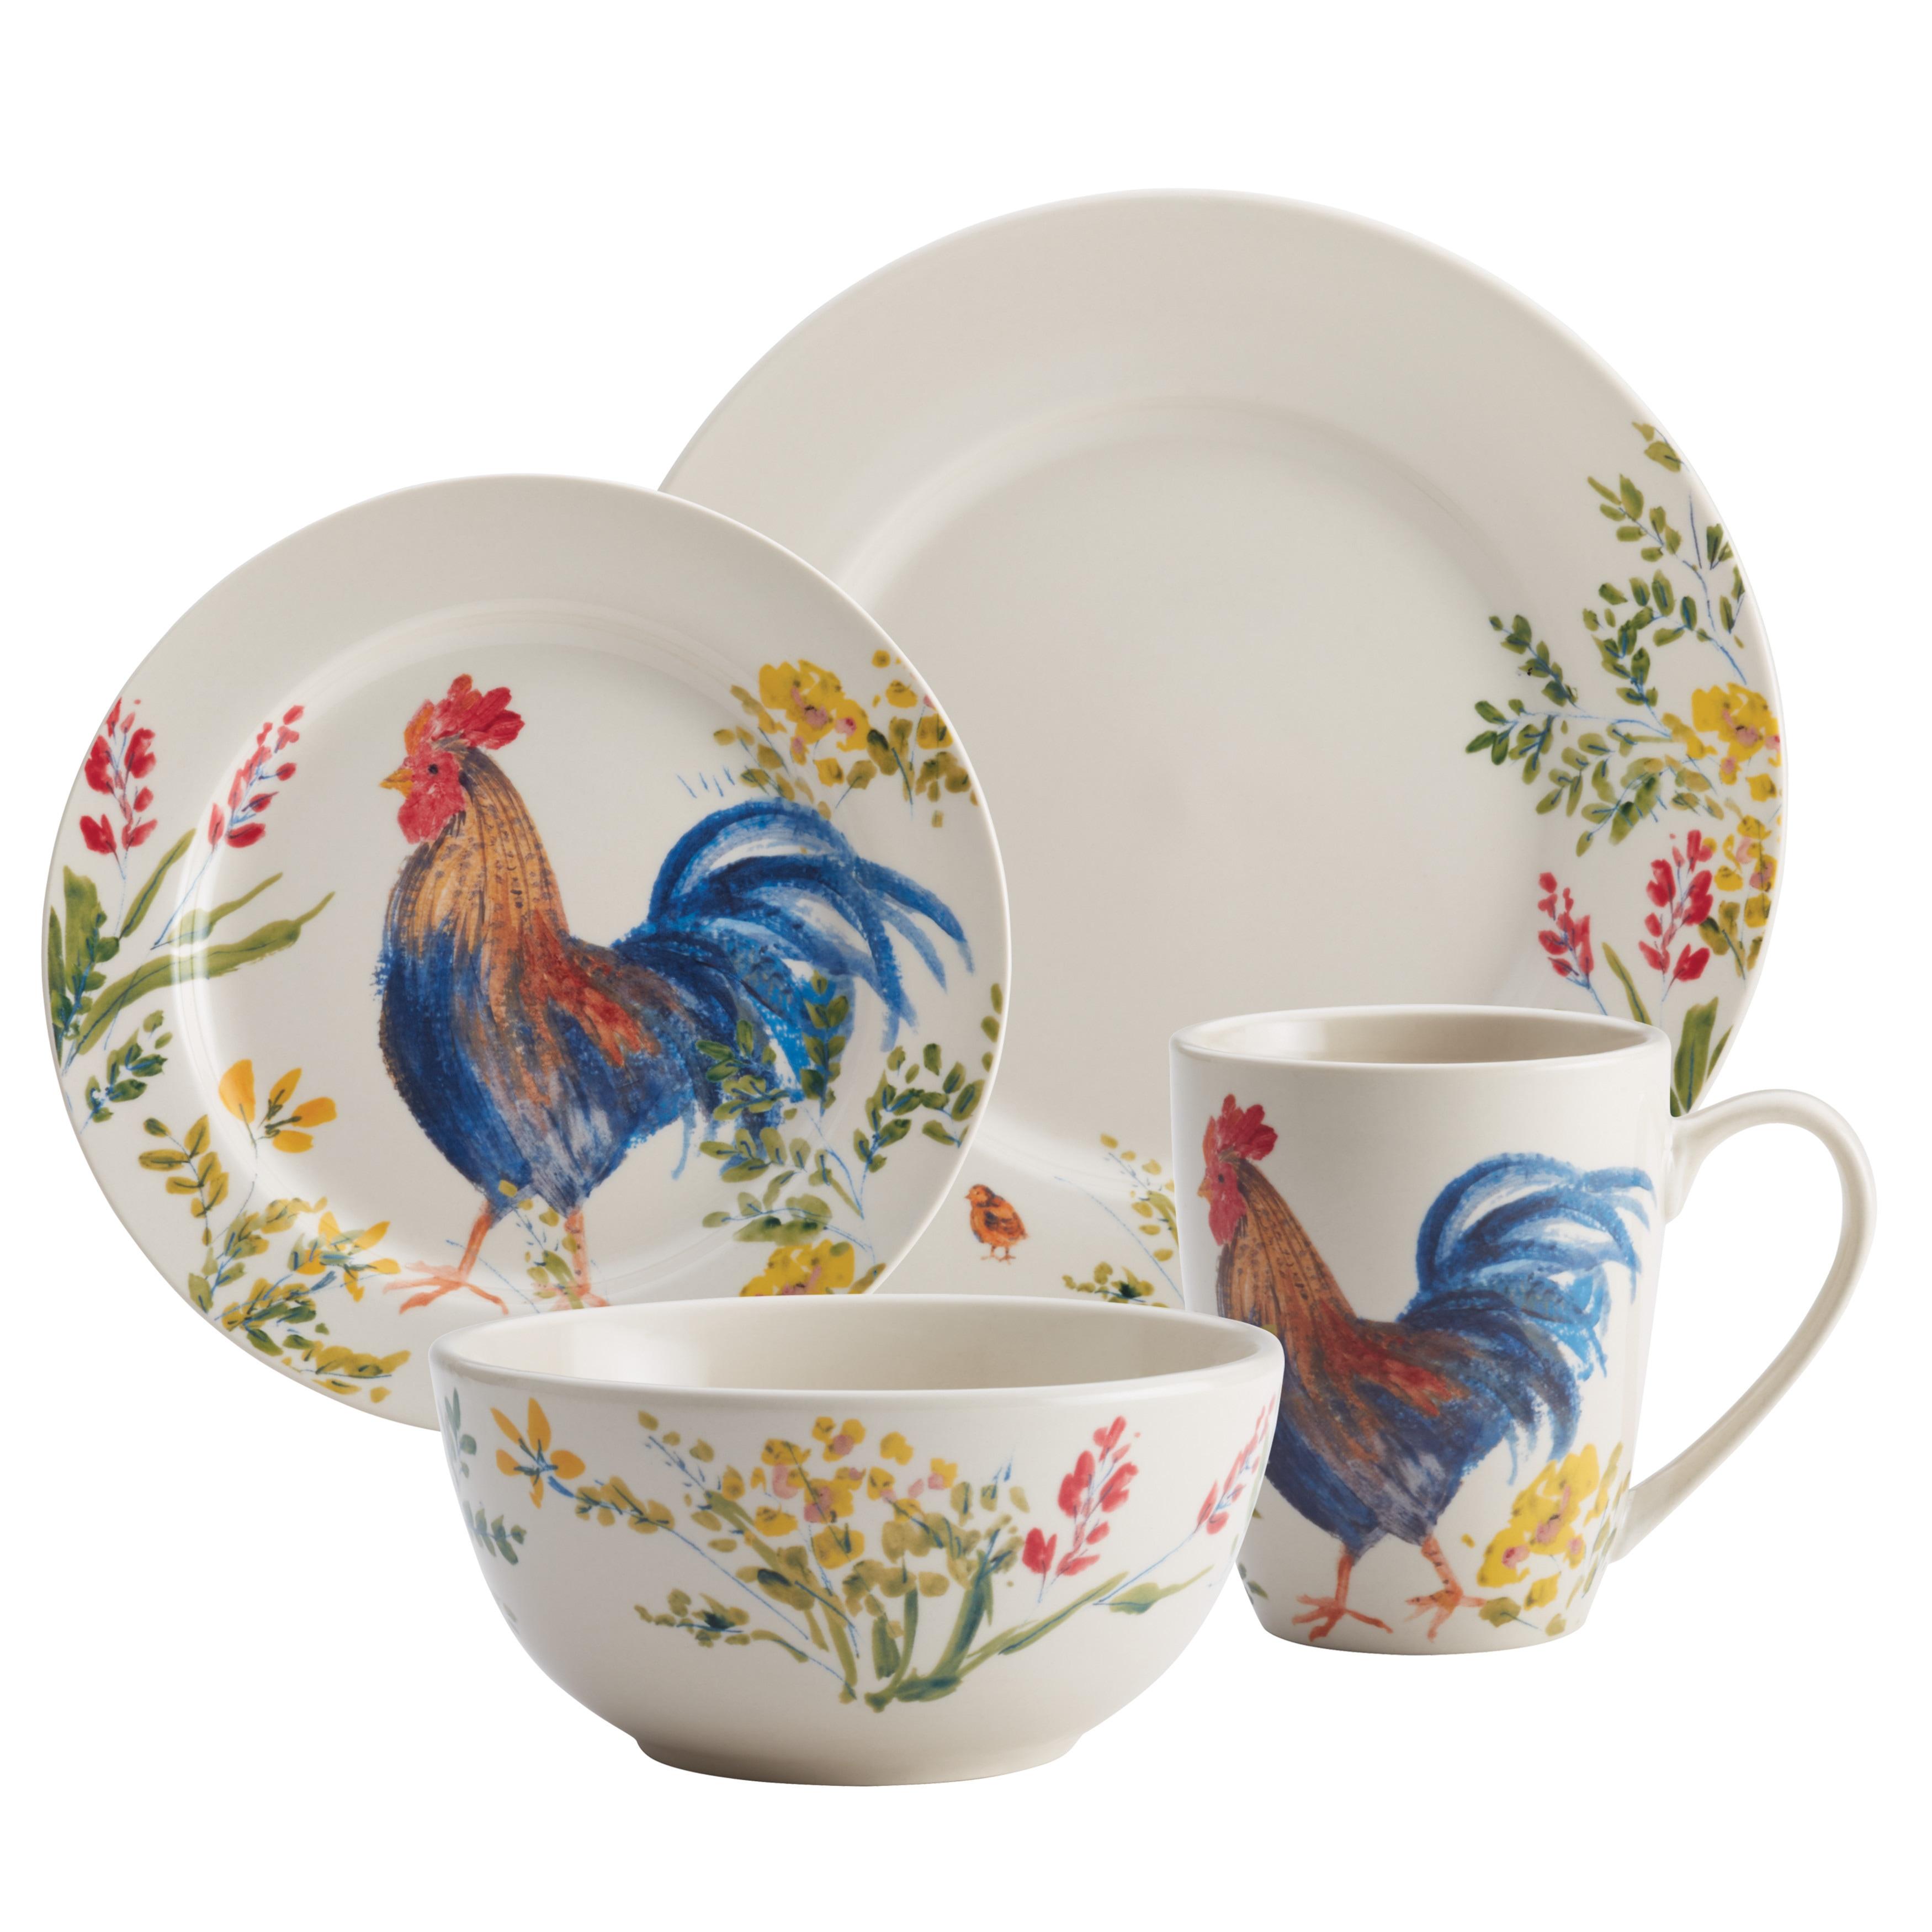 Paula Deen Dinnerware Garden Rooster 16 Piece Stoneware Set Free Shipping Today 17627005